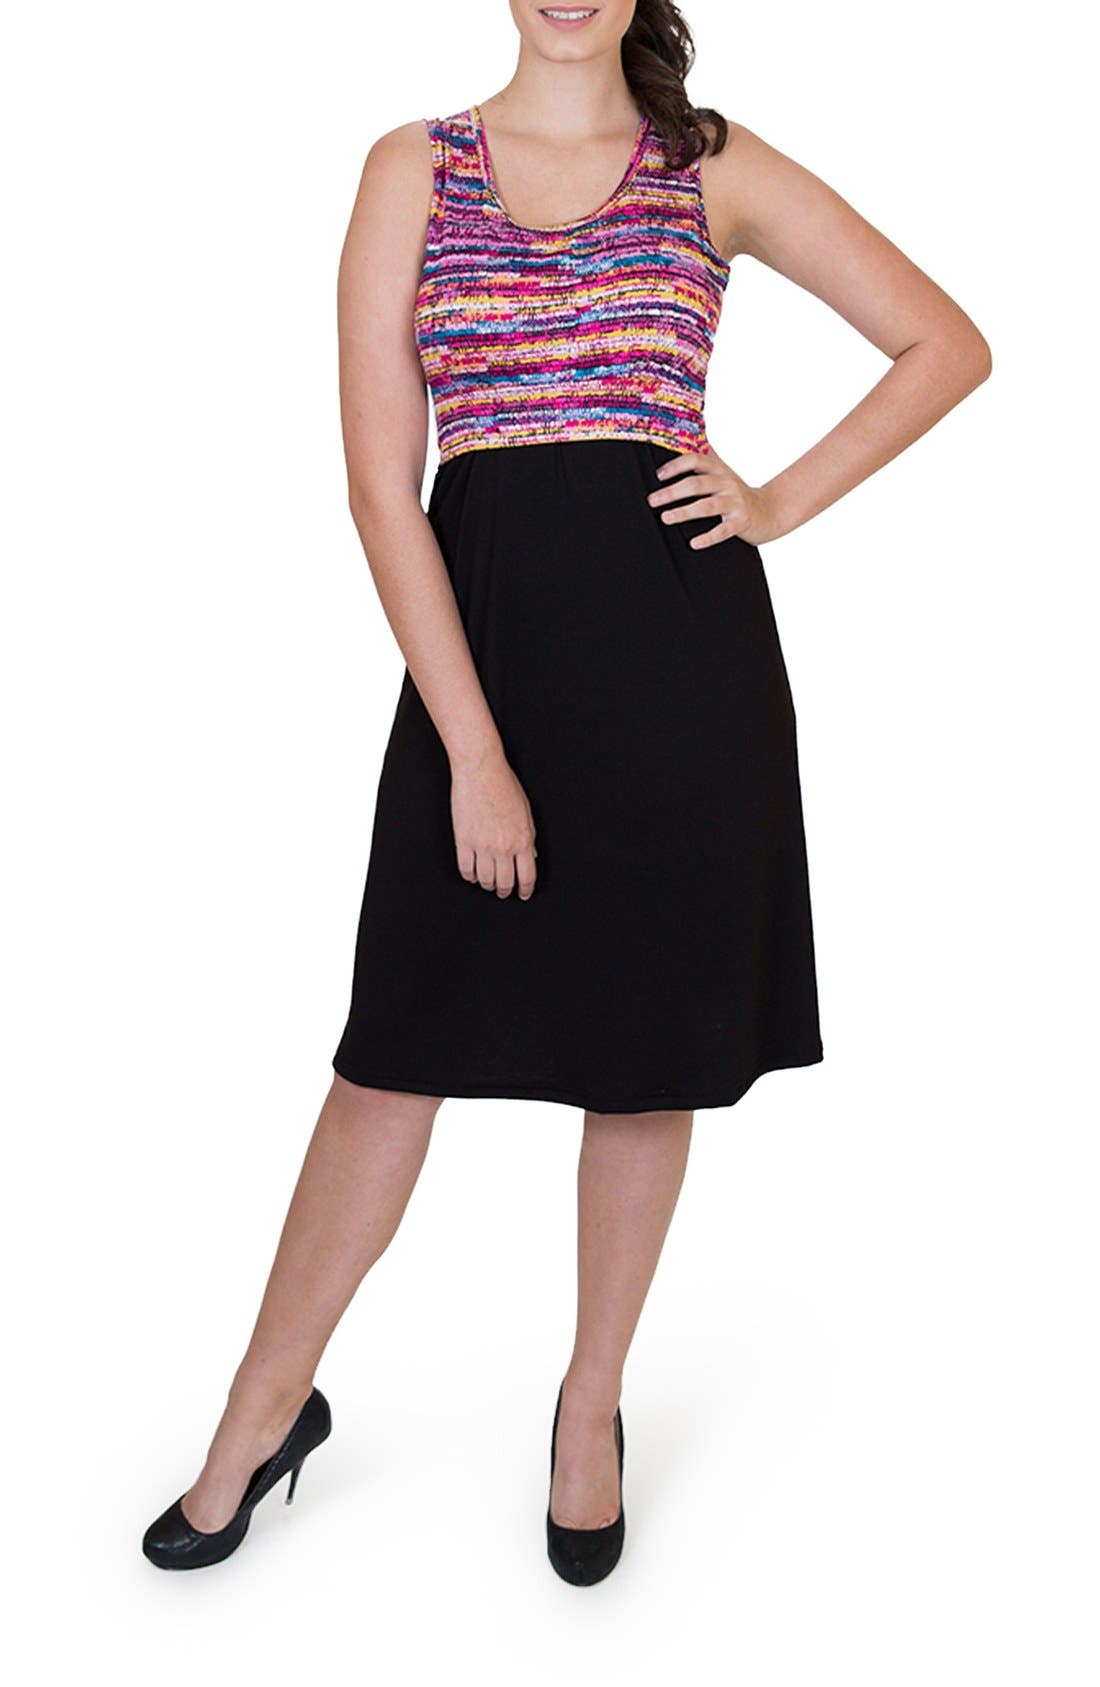 'Ana' Maternity/Nursing Dress,                         Main,                         color, Colorful Top W/ Black Skirt